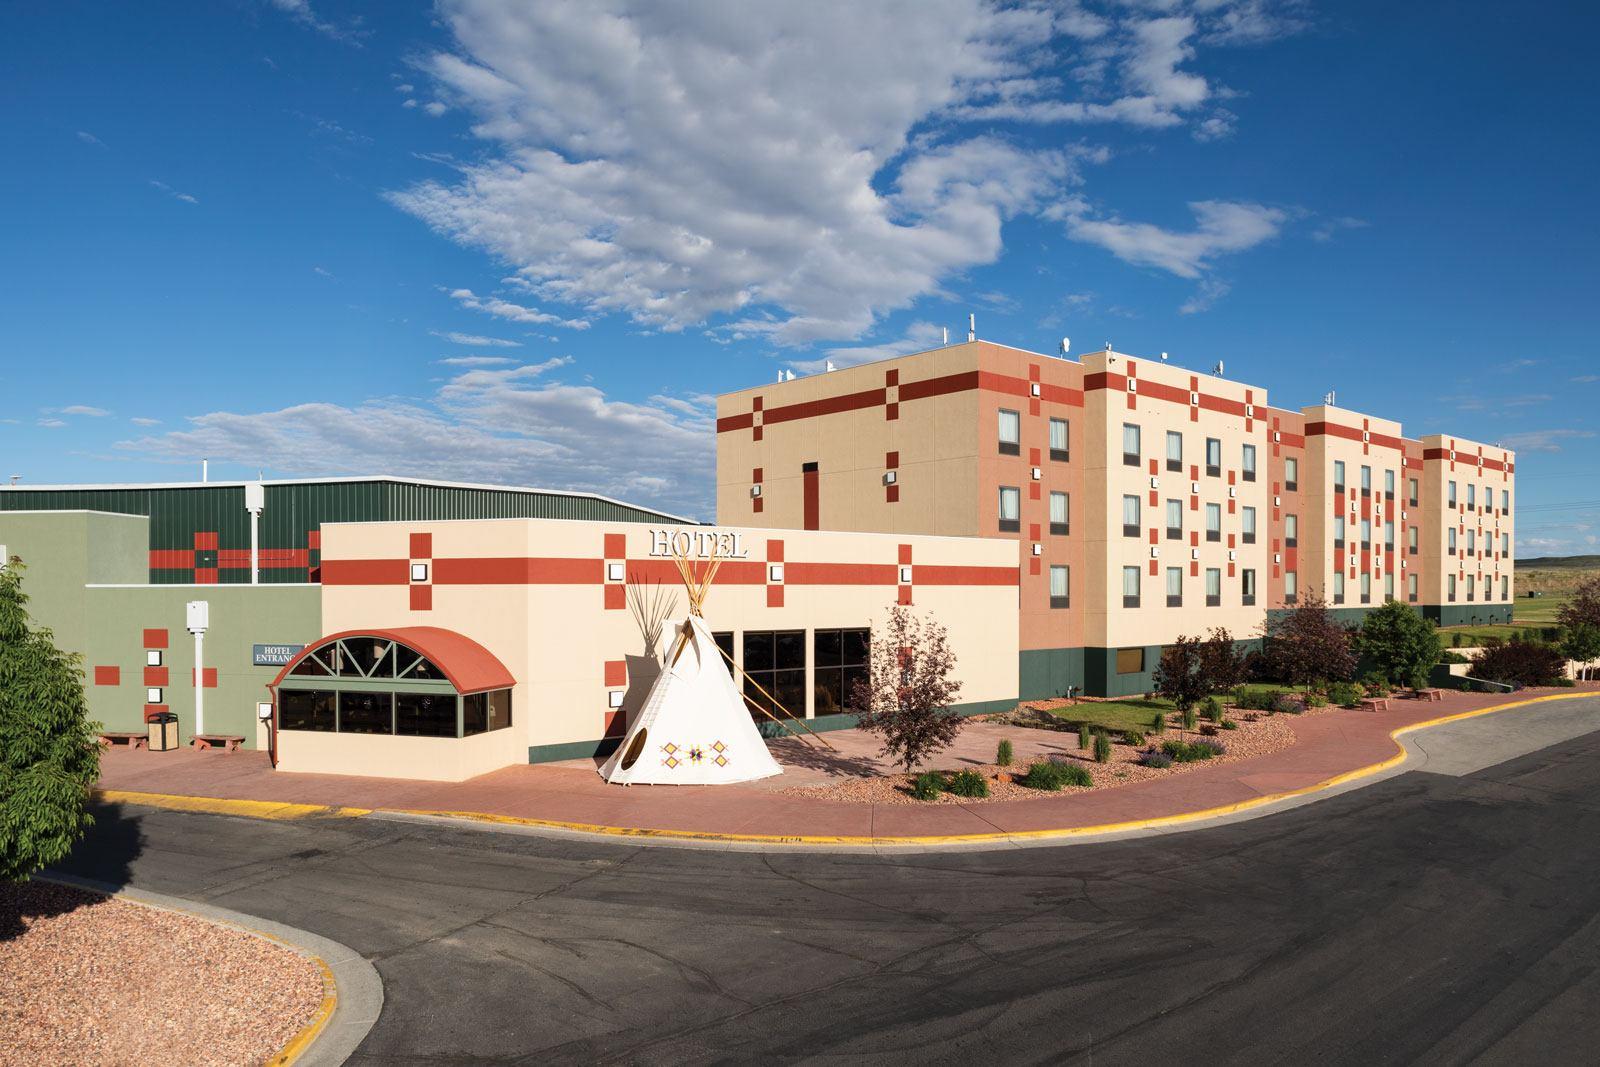 Wyoming gambling legislation